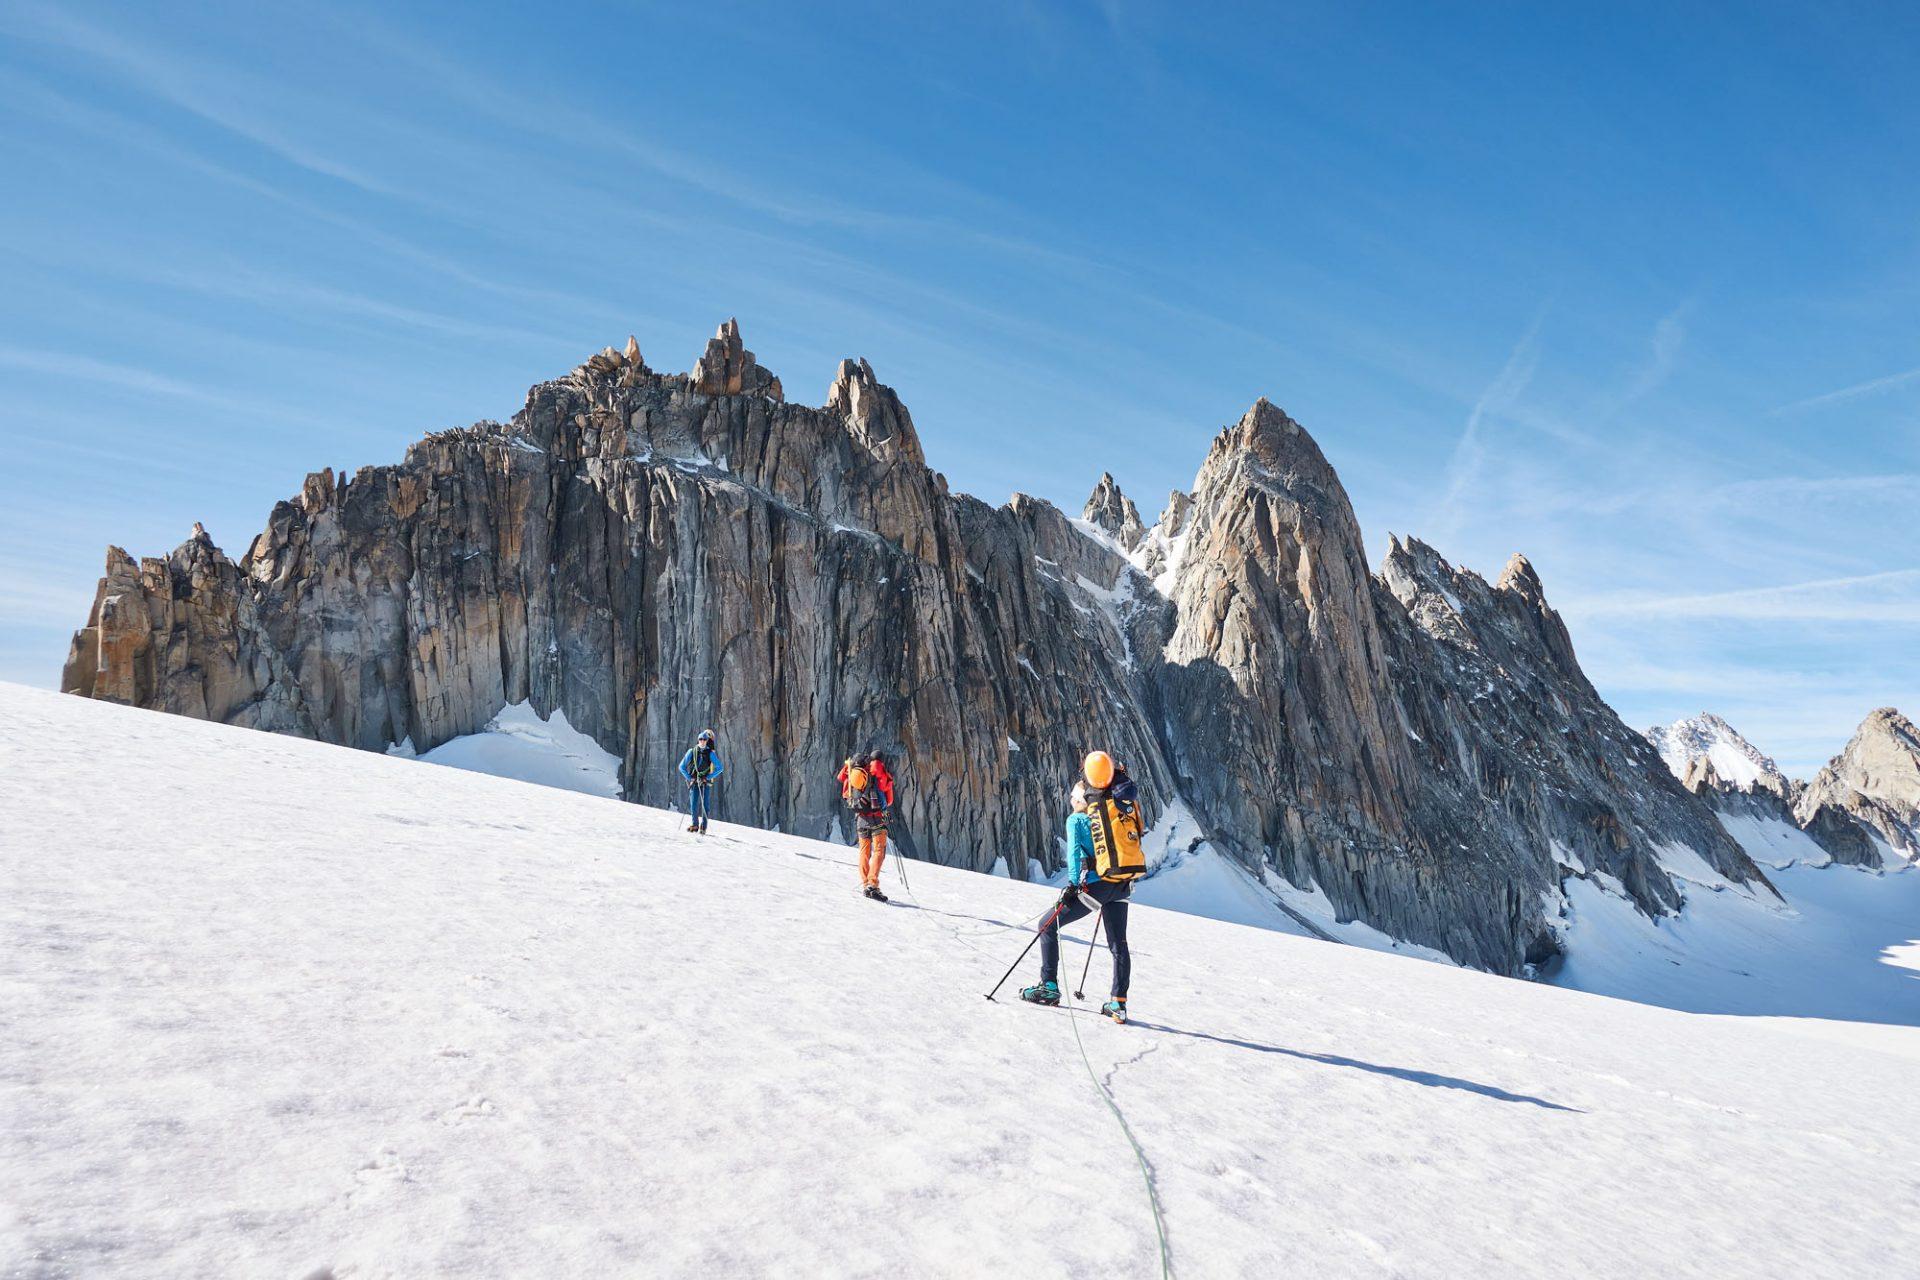 ALPINIST: Aiguilles Dorées mit dem Projekt Alpinist